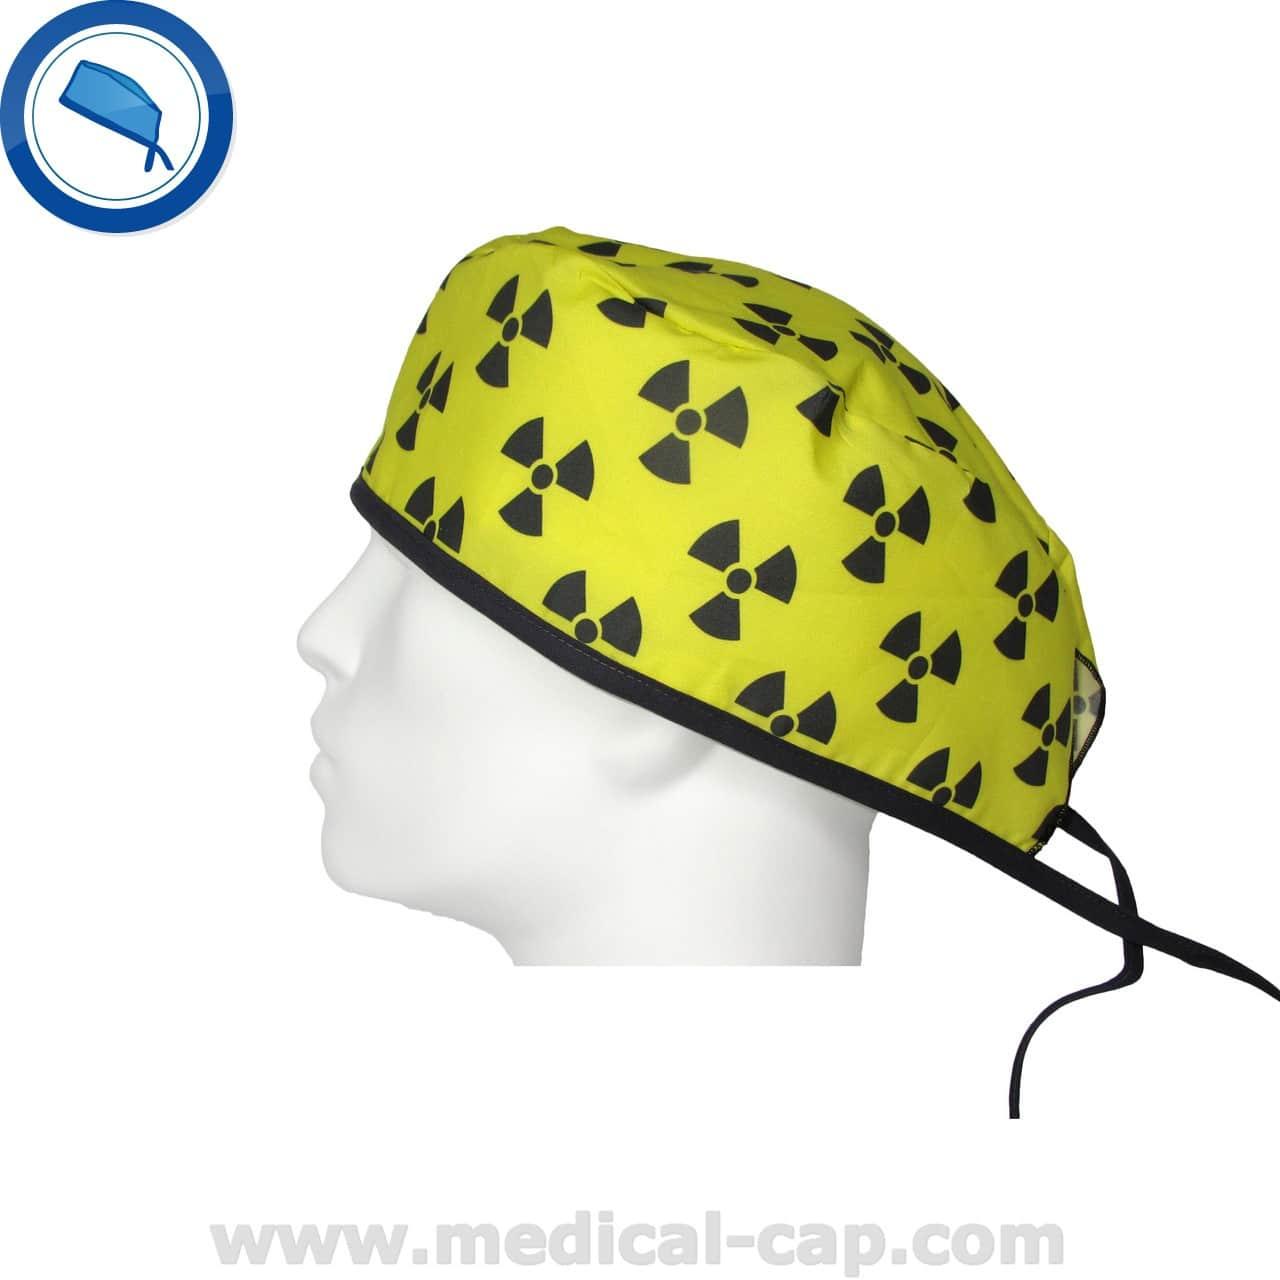 9ecae652ec1 Radiologists Cap Radiation symbol yellow – Man